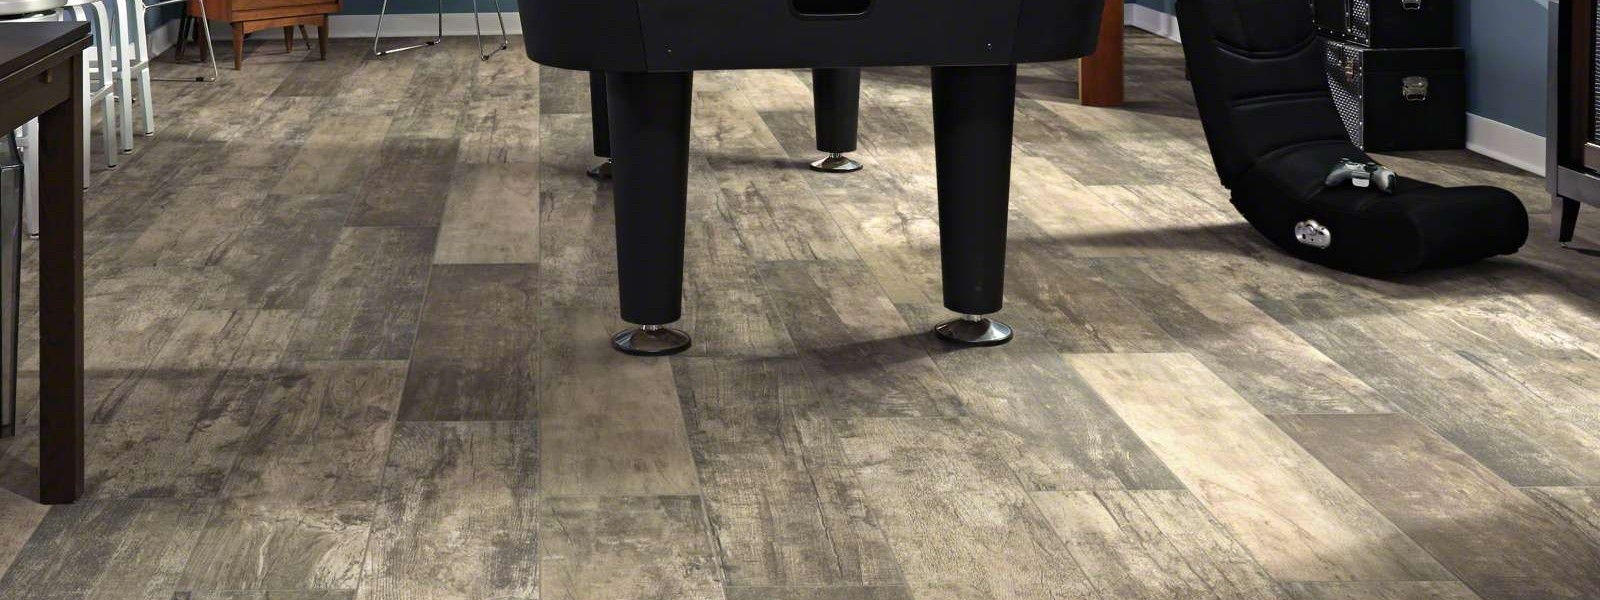 Tile flooring | TUF Flooring LLC